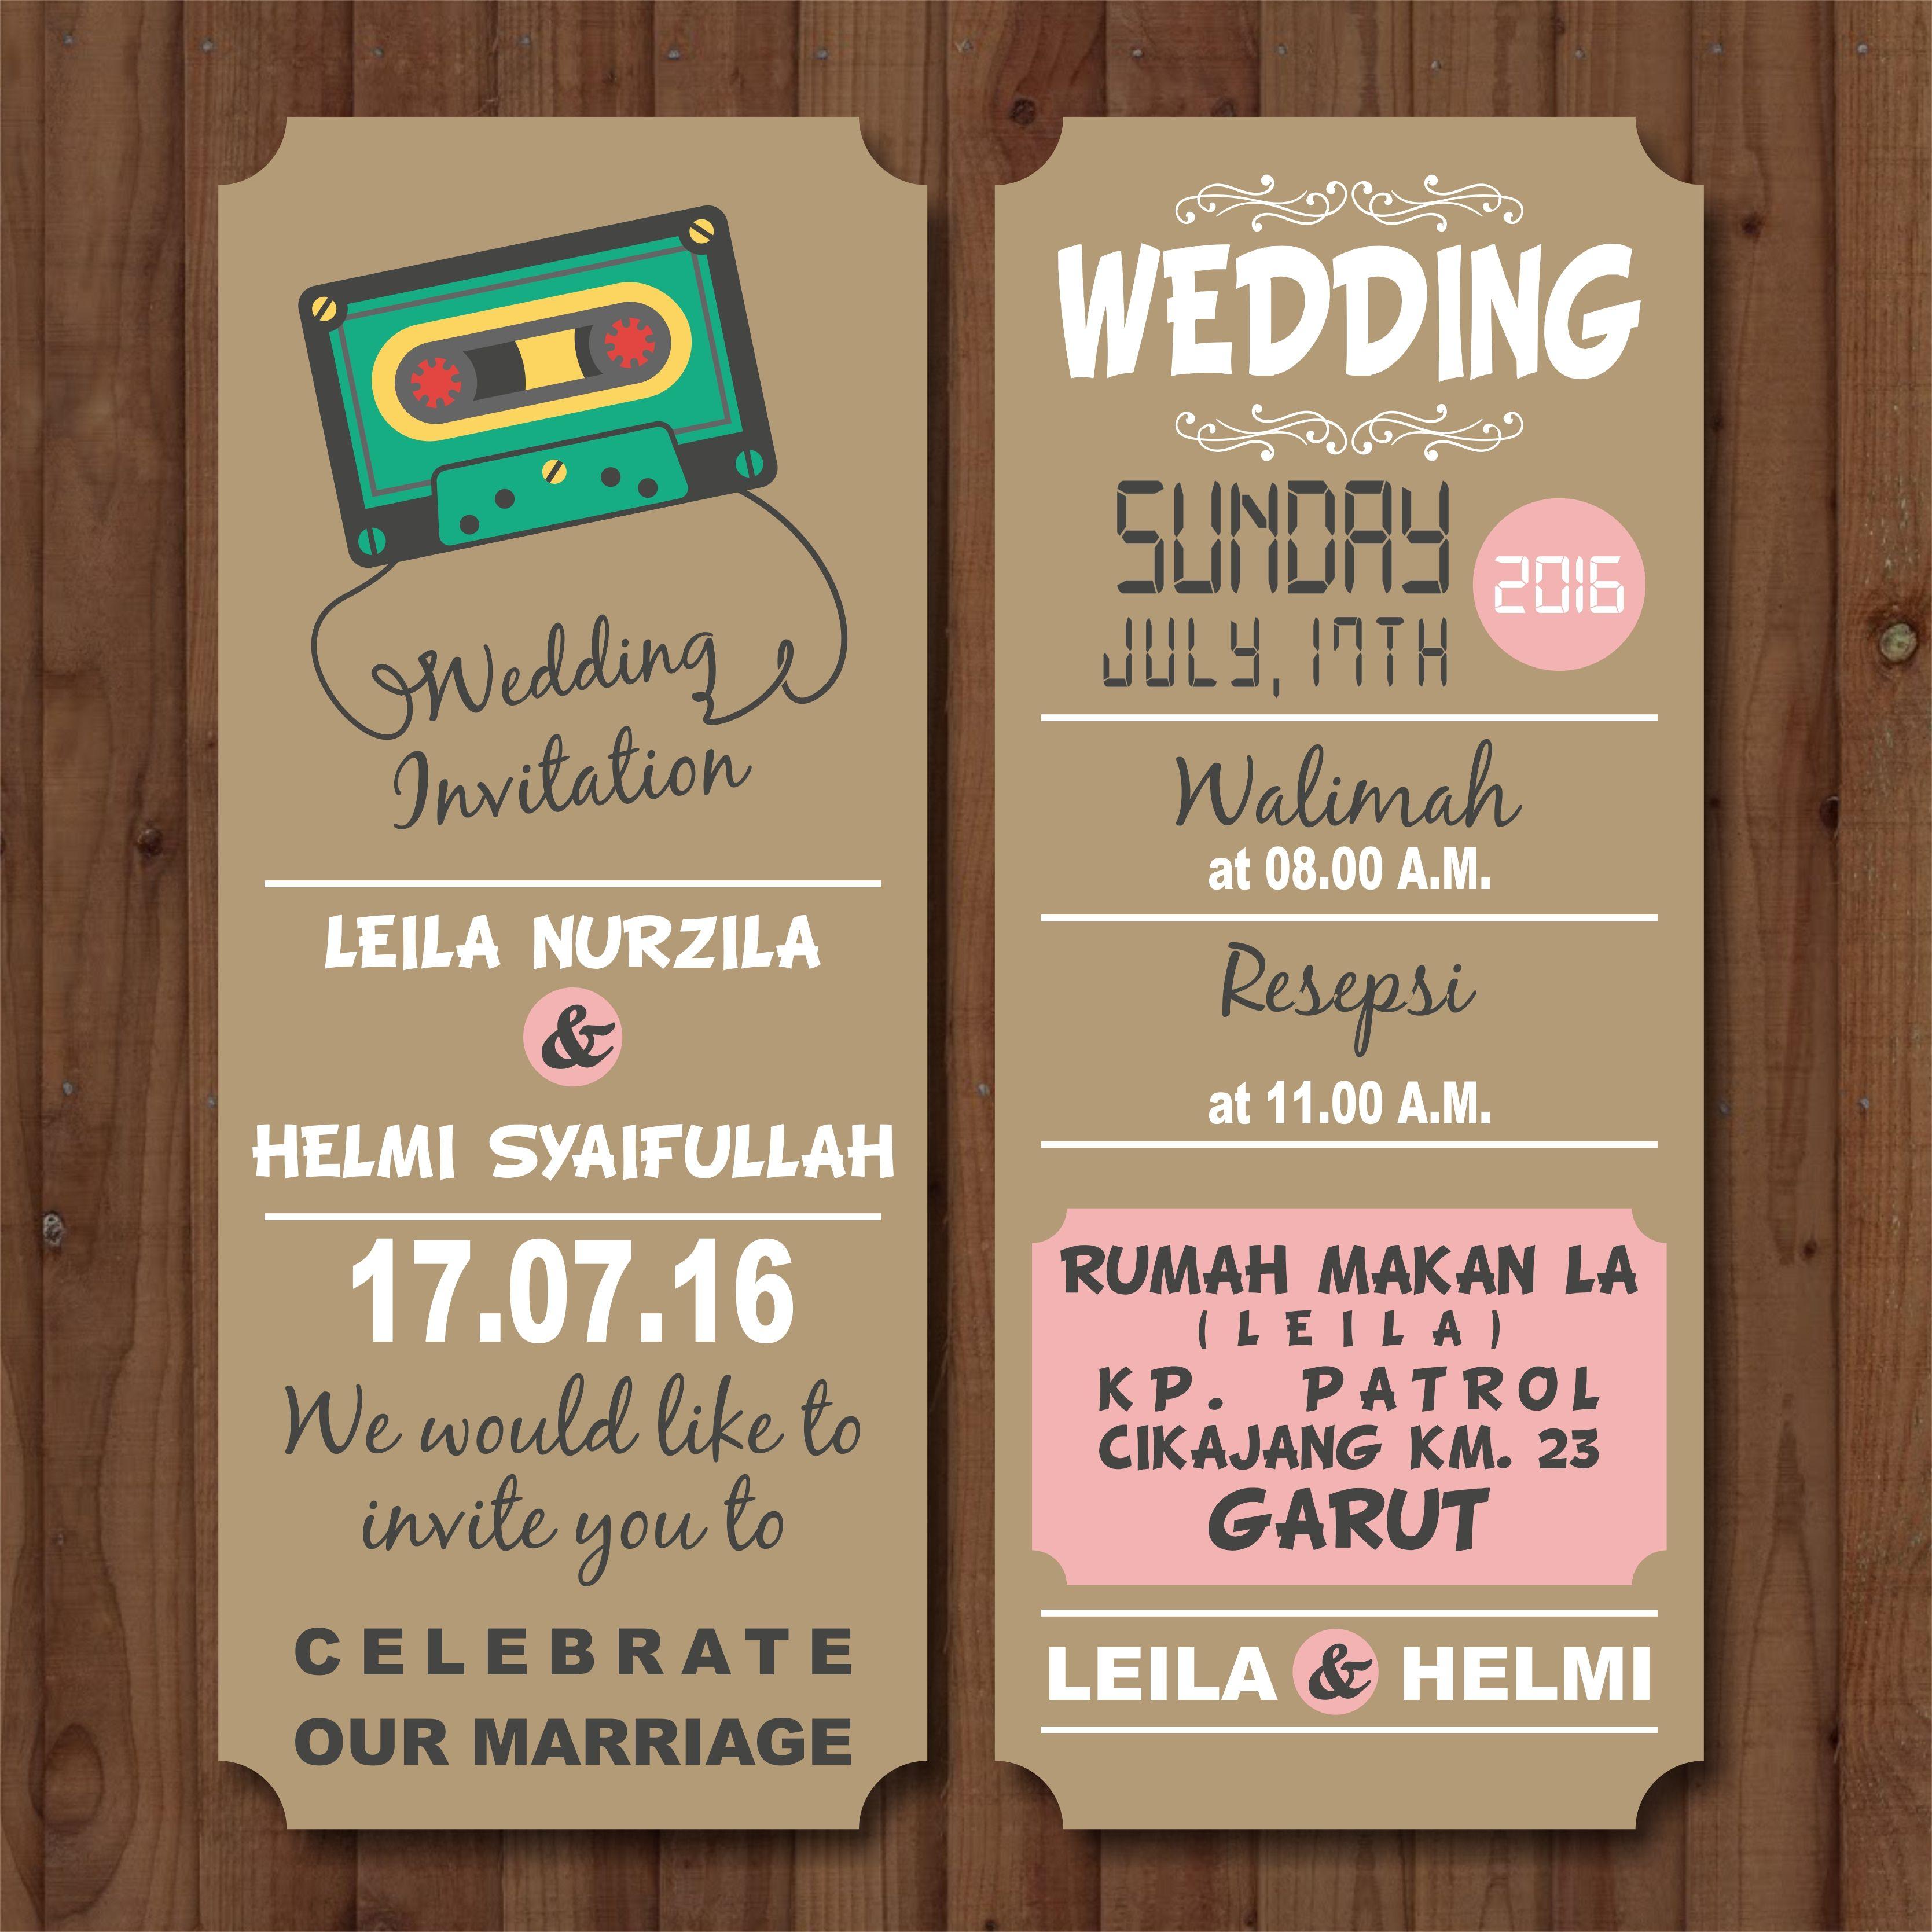 online wedding invitation e invitation wedding inviation - Wedding E Invitations